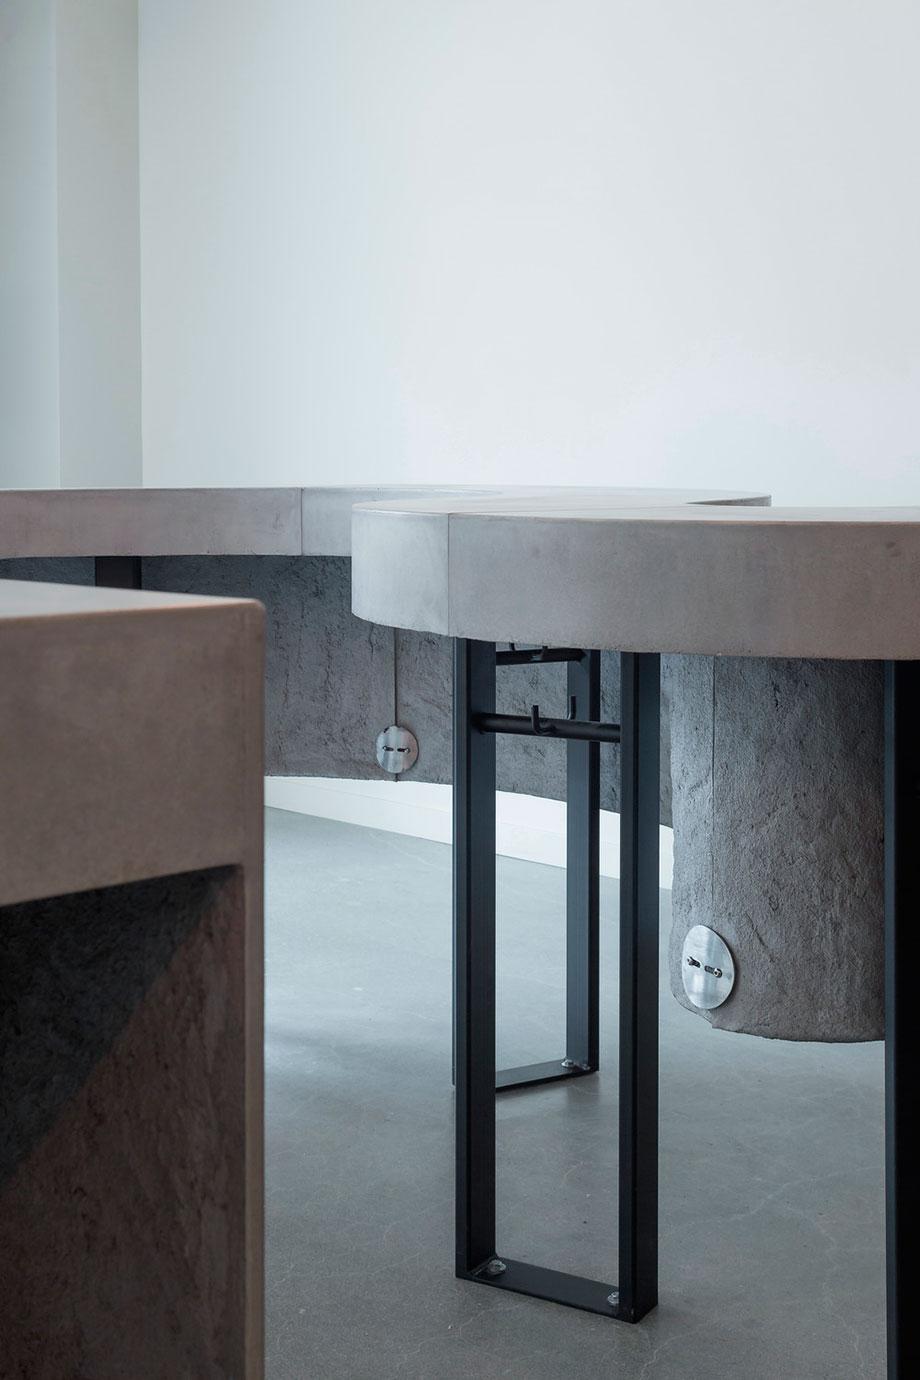 shuck shuck de batay-csorba architects (8) - foto silentsama